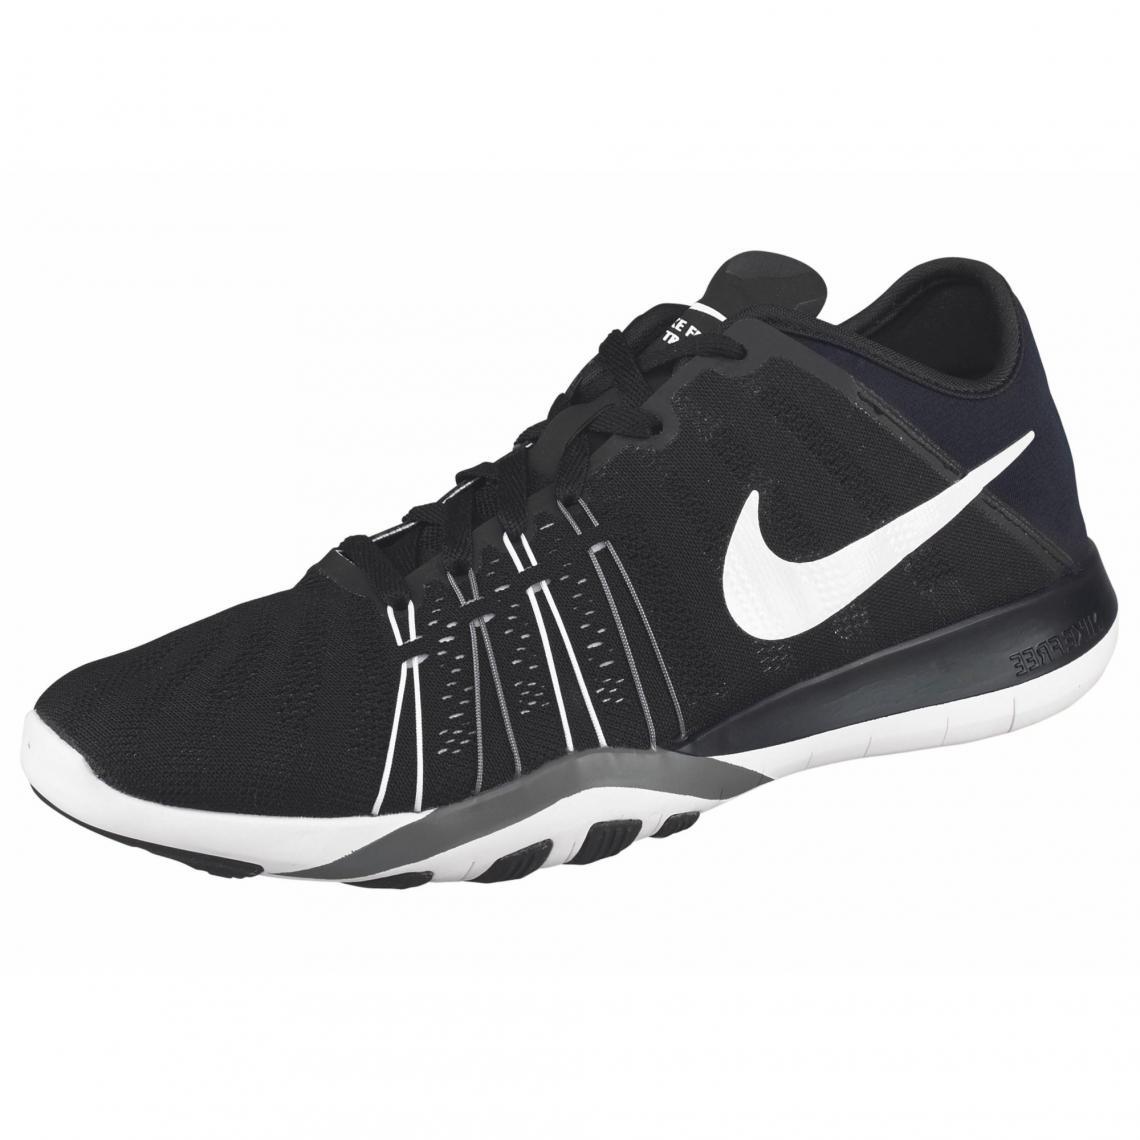 quality design fc330 b272c Nike Free TR 6 chaussures de training femme - Noir Nike Femme